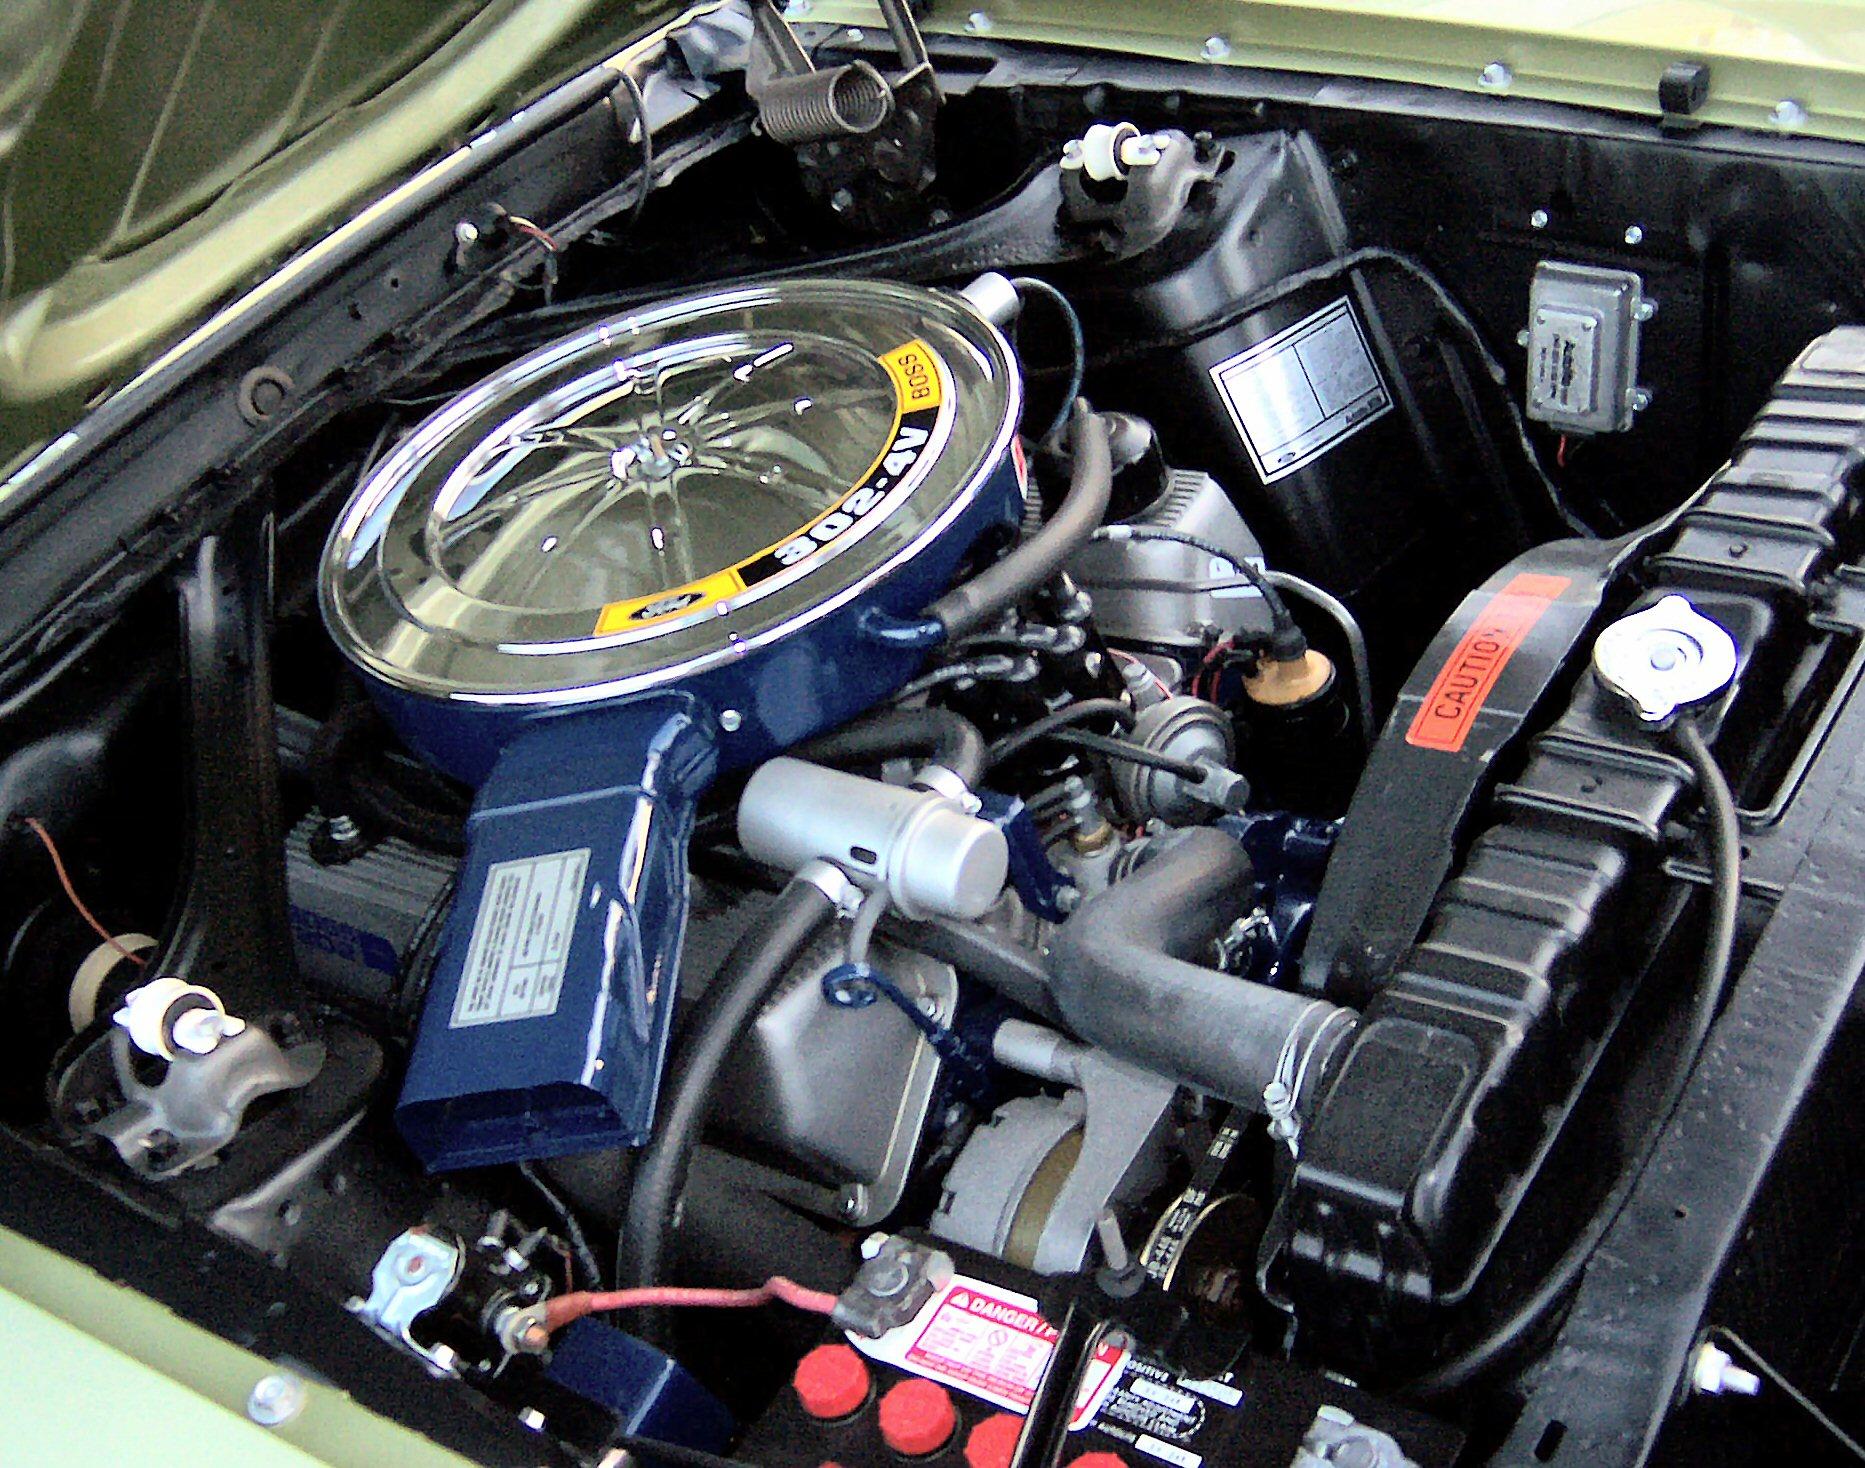 1981 Motor 302 Chevy